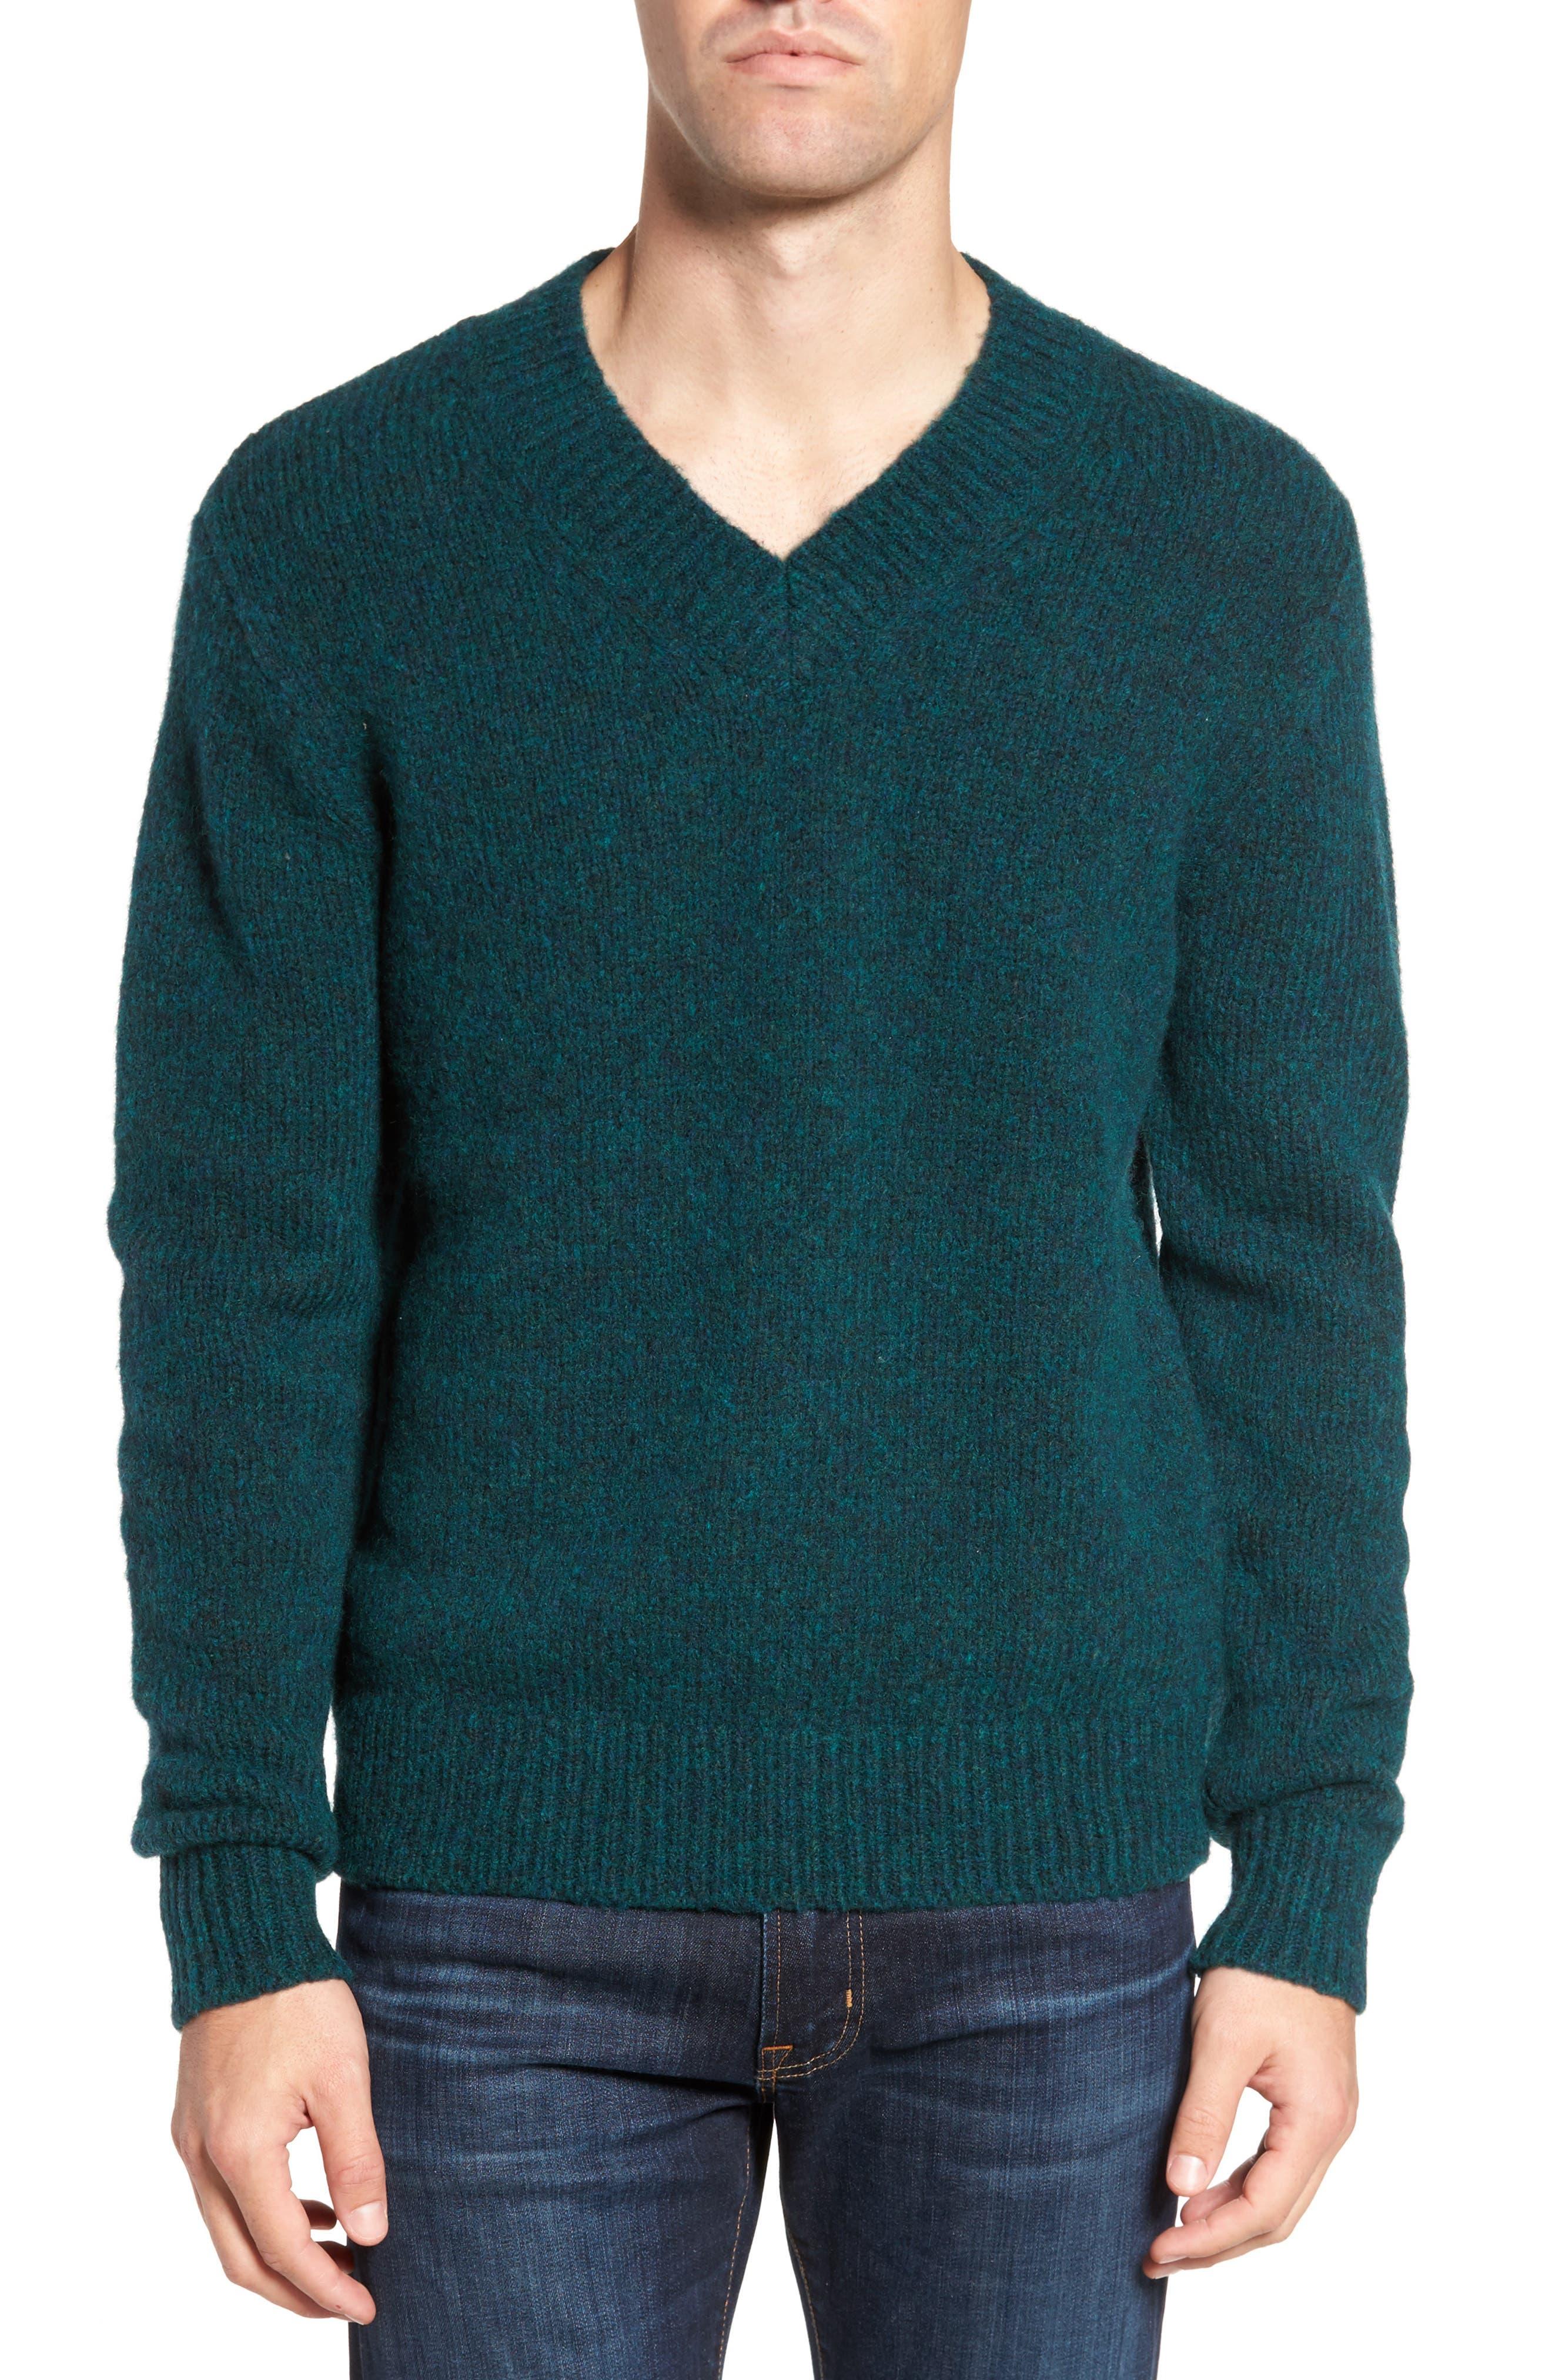 Alternate Image 1 Selected - Bonobos Fuzzy Deep V-Neck Wool Blend Sweater